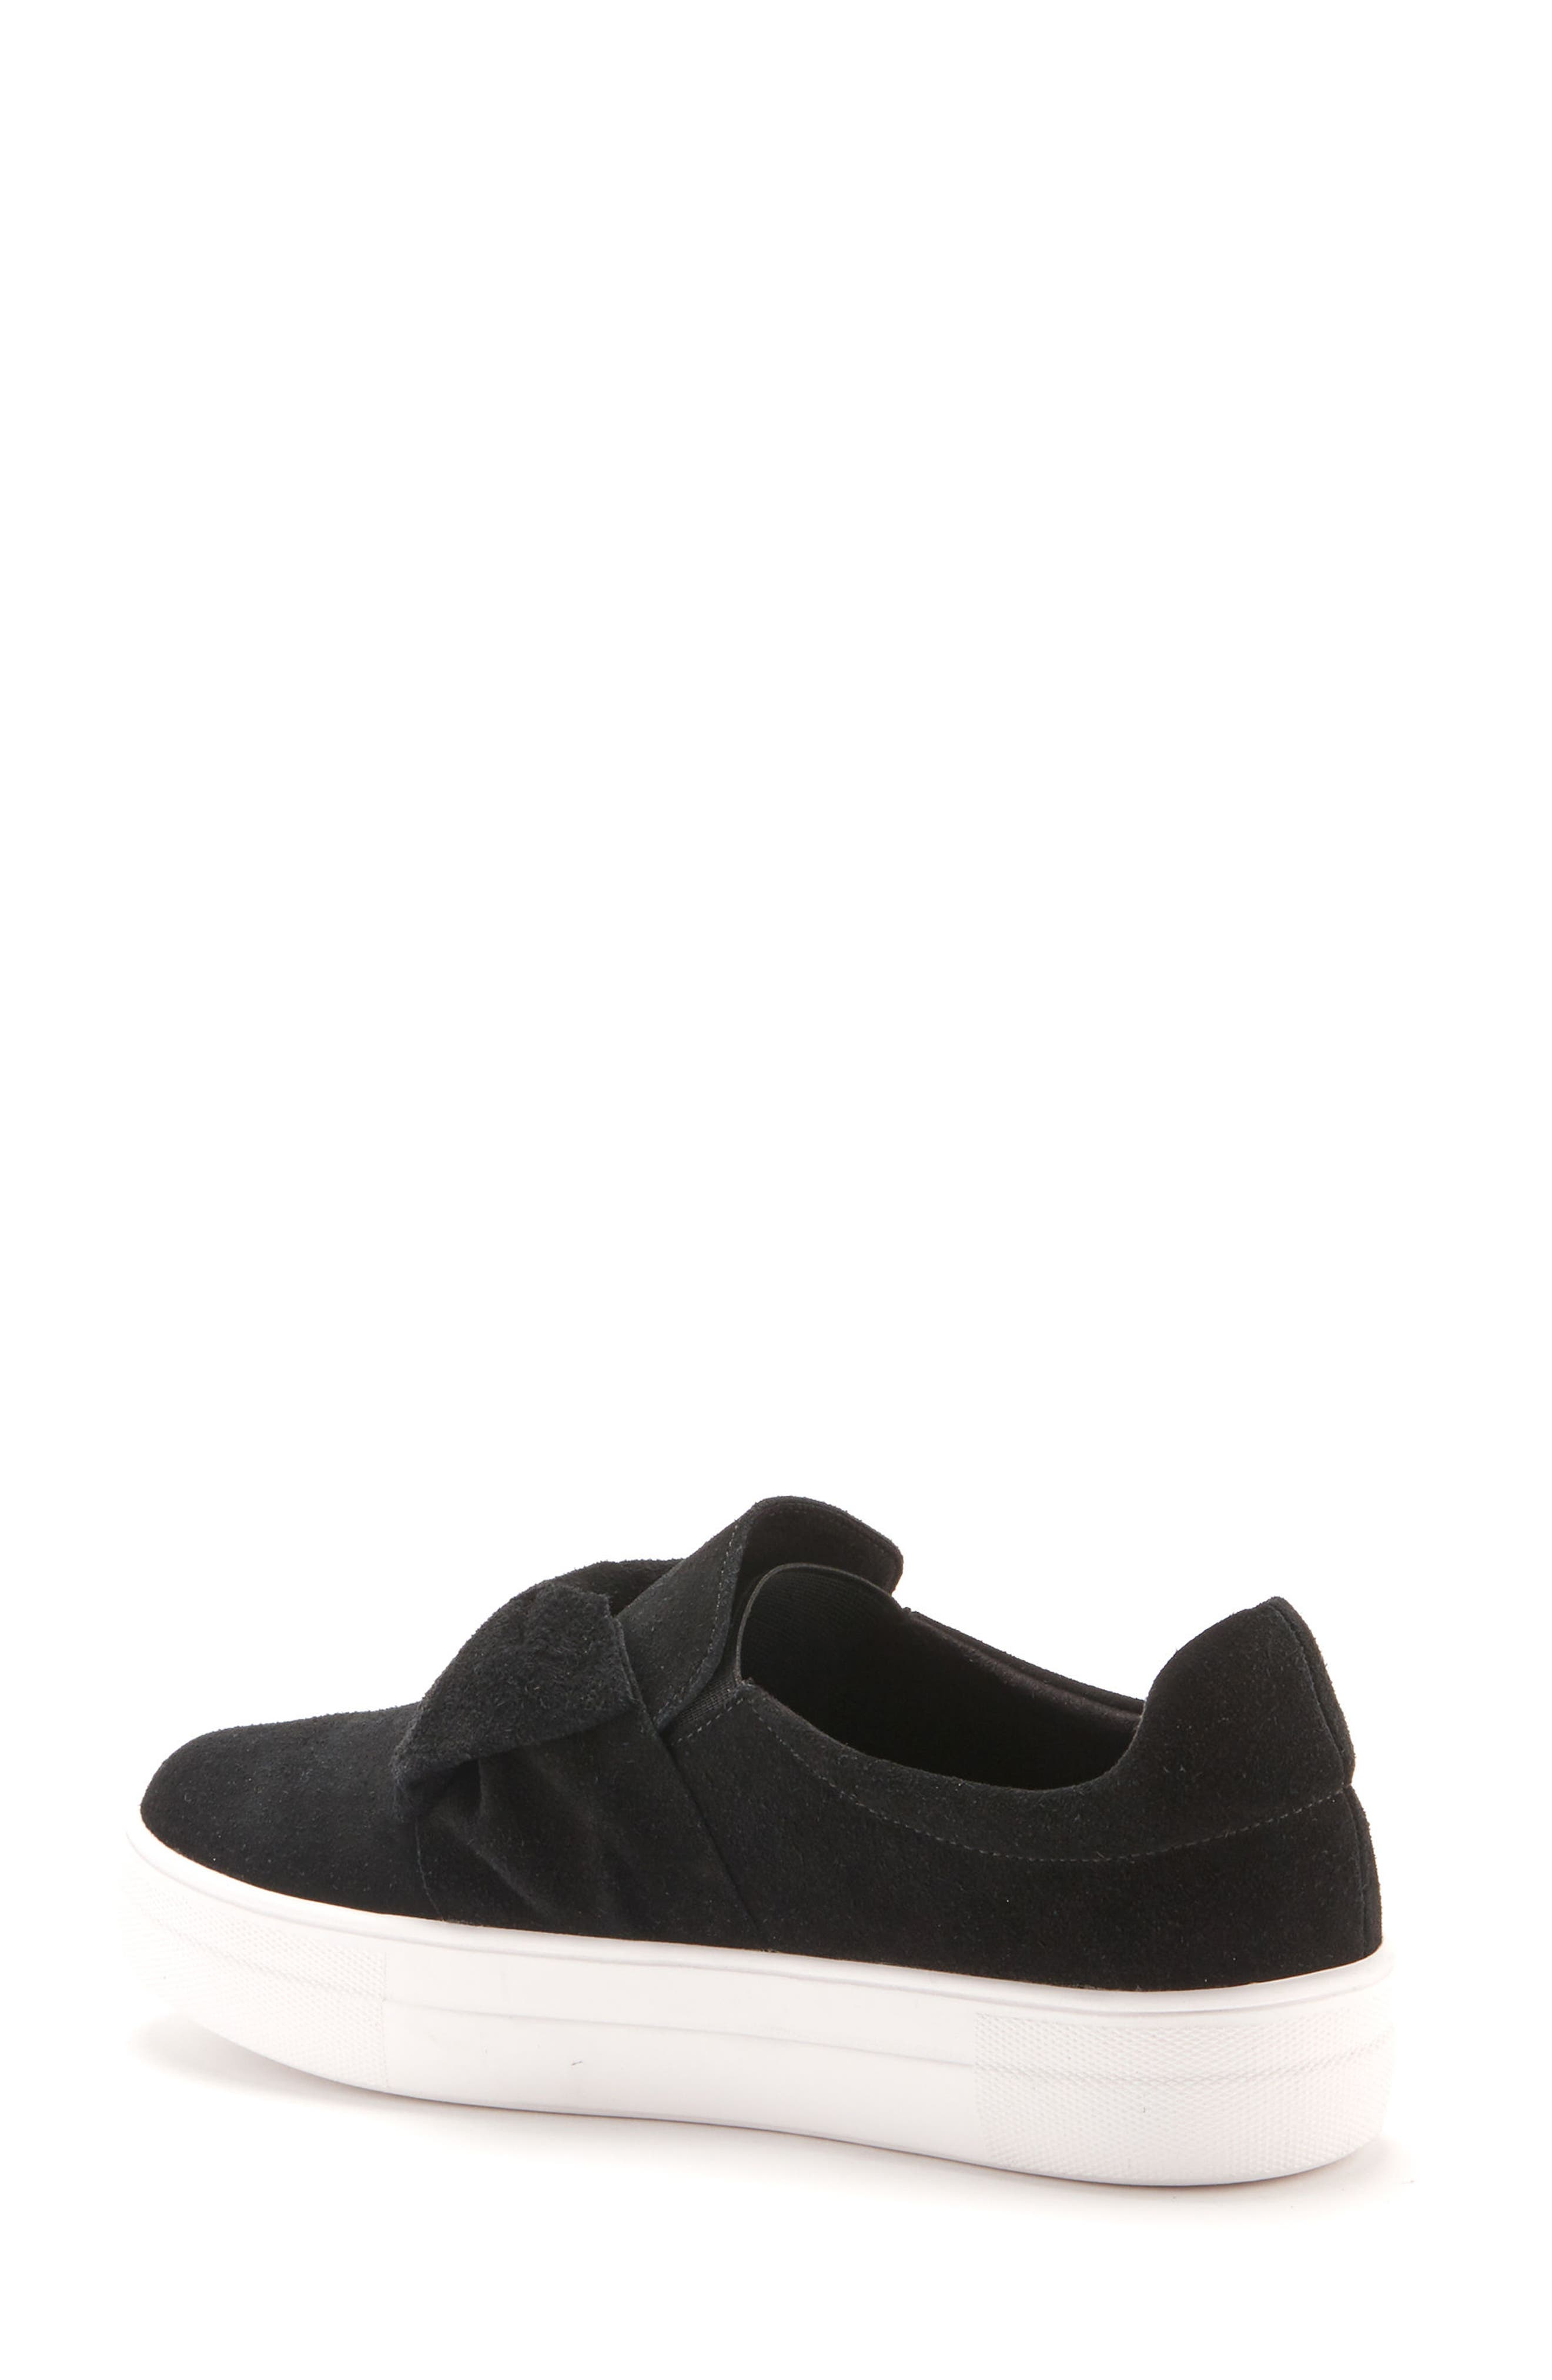 Gigi Sneaker,                             Alternate thumbnail 2, color,                             Black Suede